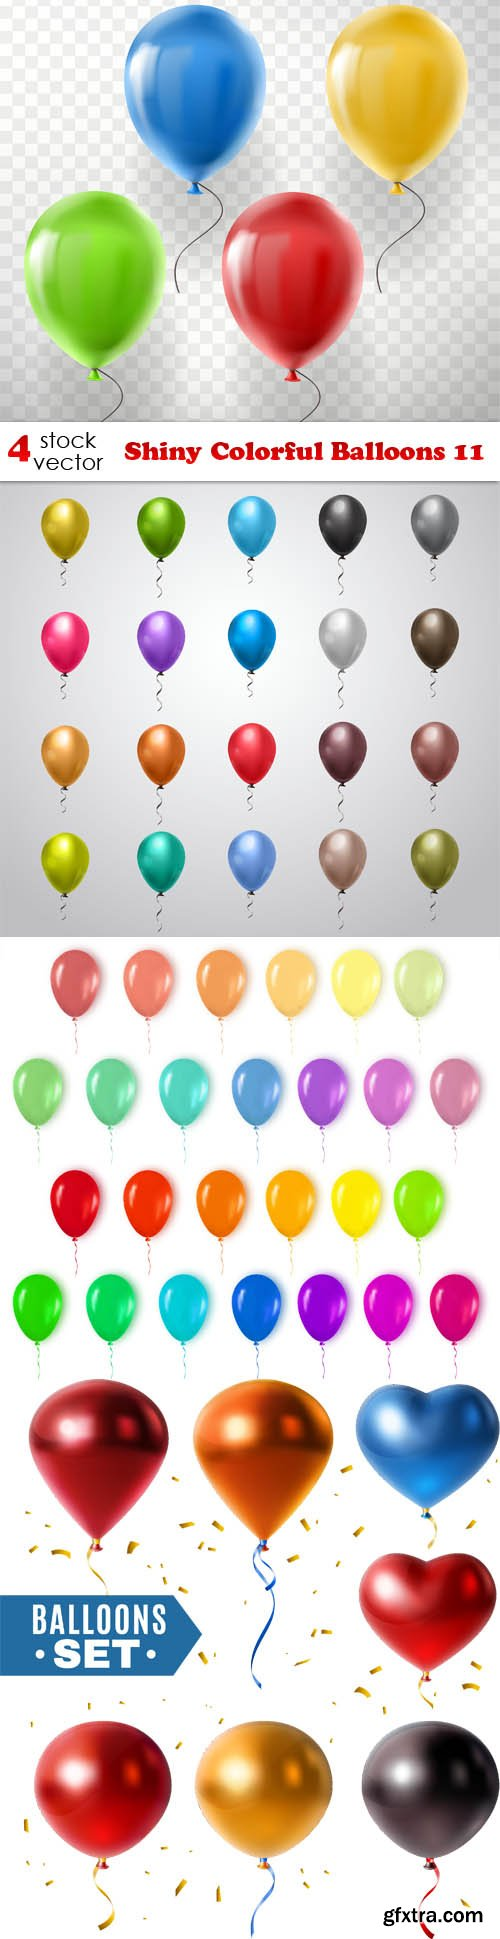 Vectors - Shiny Colorful Balloons 11